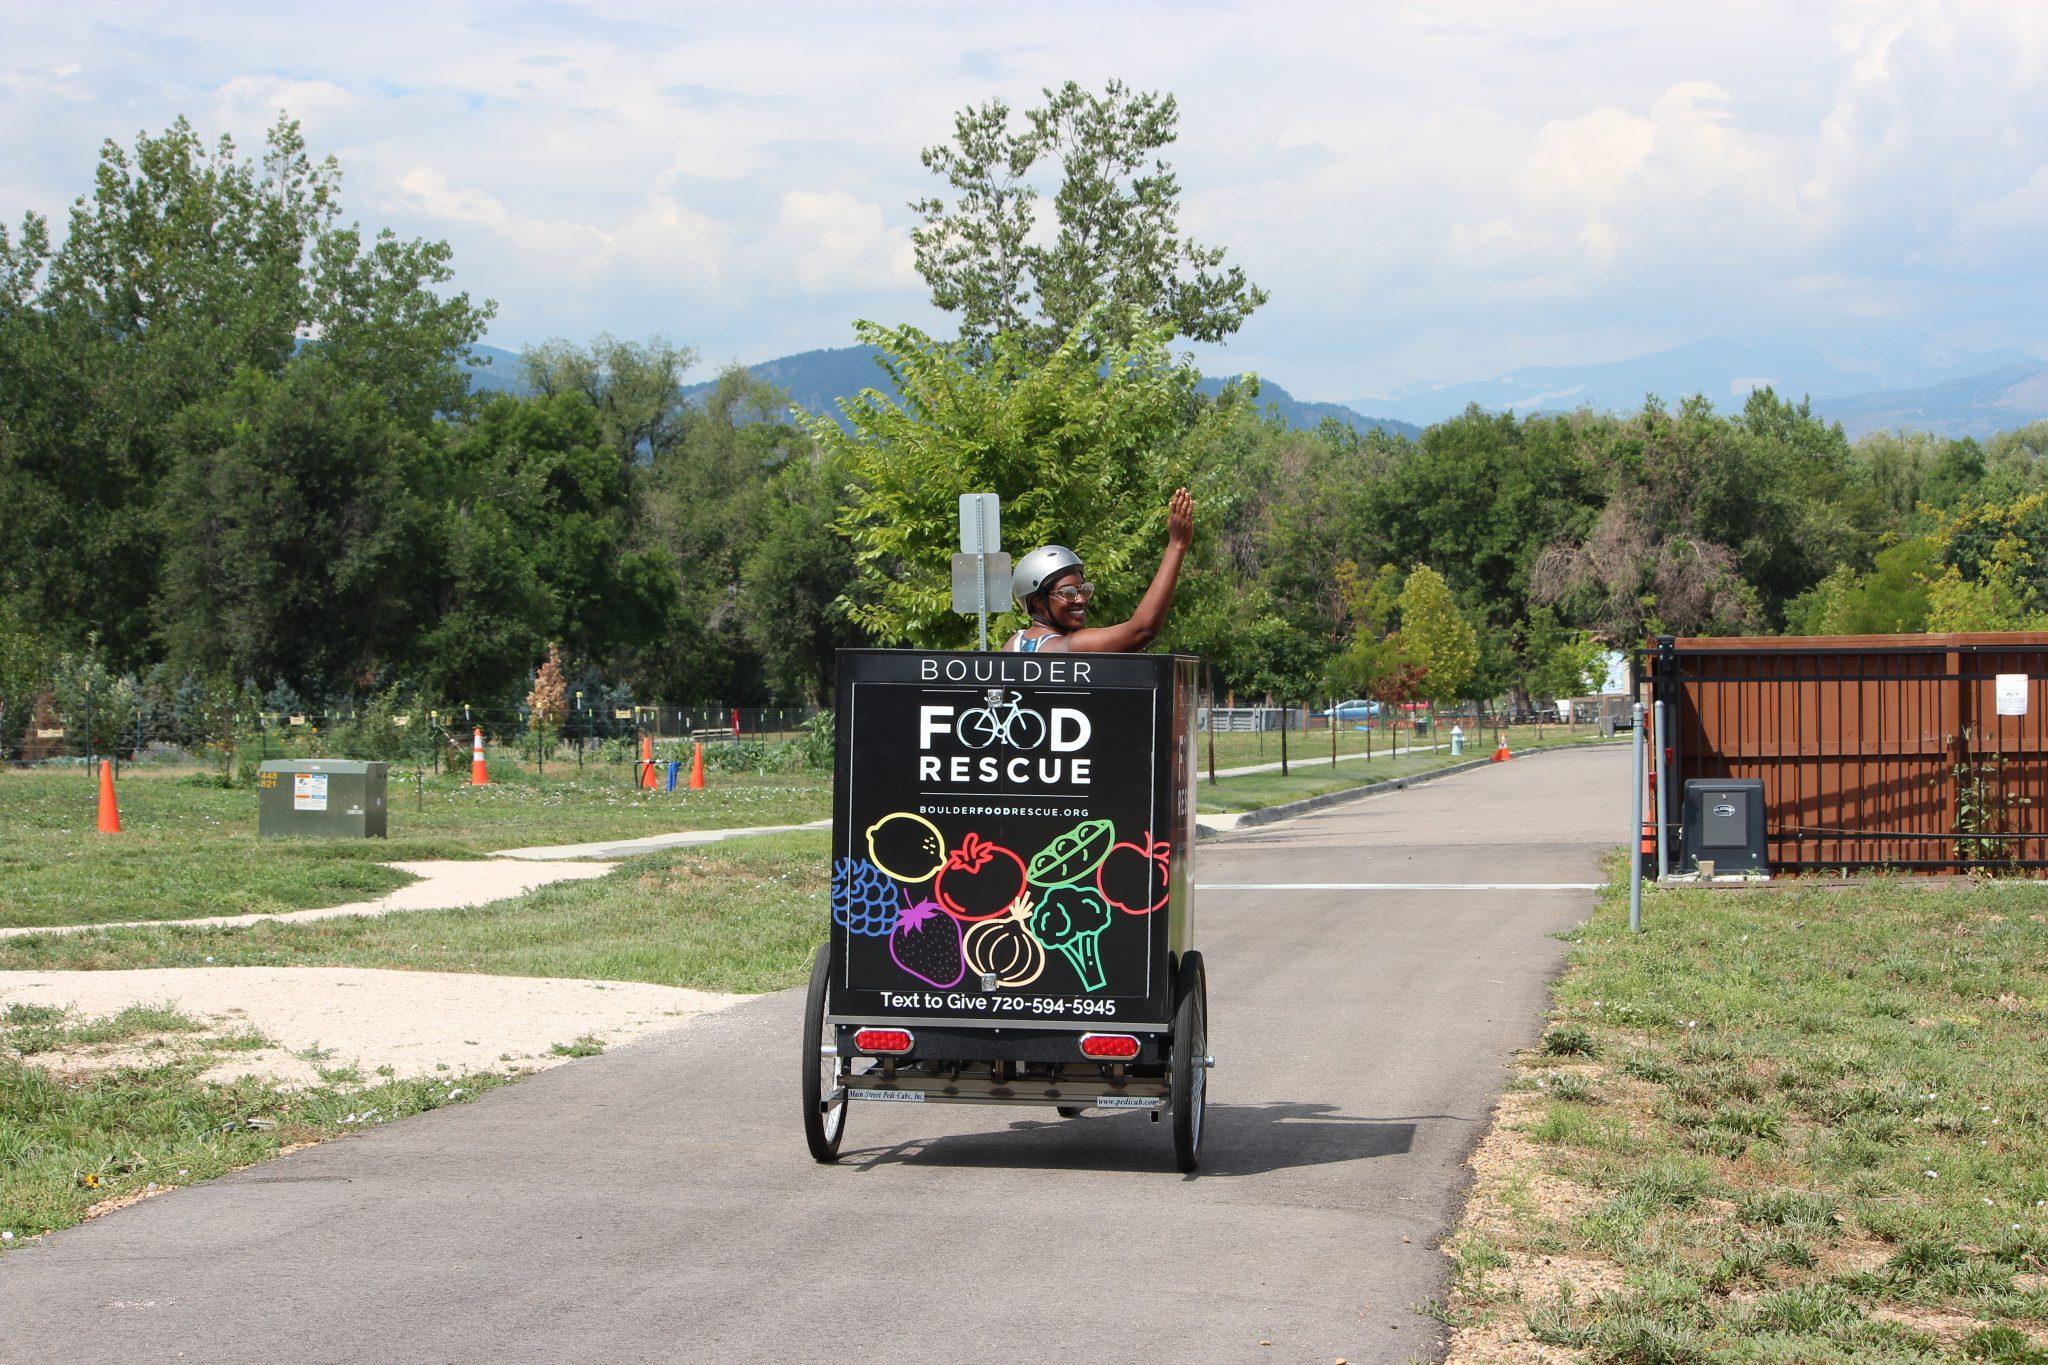 Electric bicycle trailer redistributing fresh food